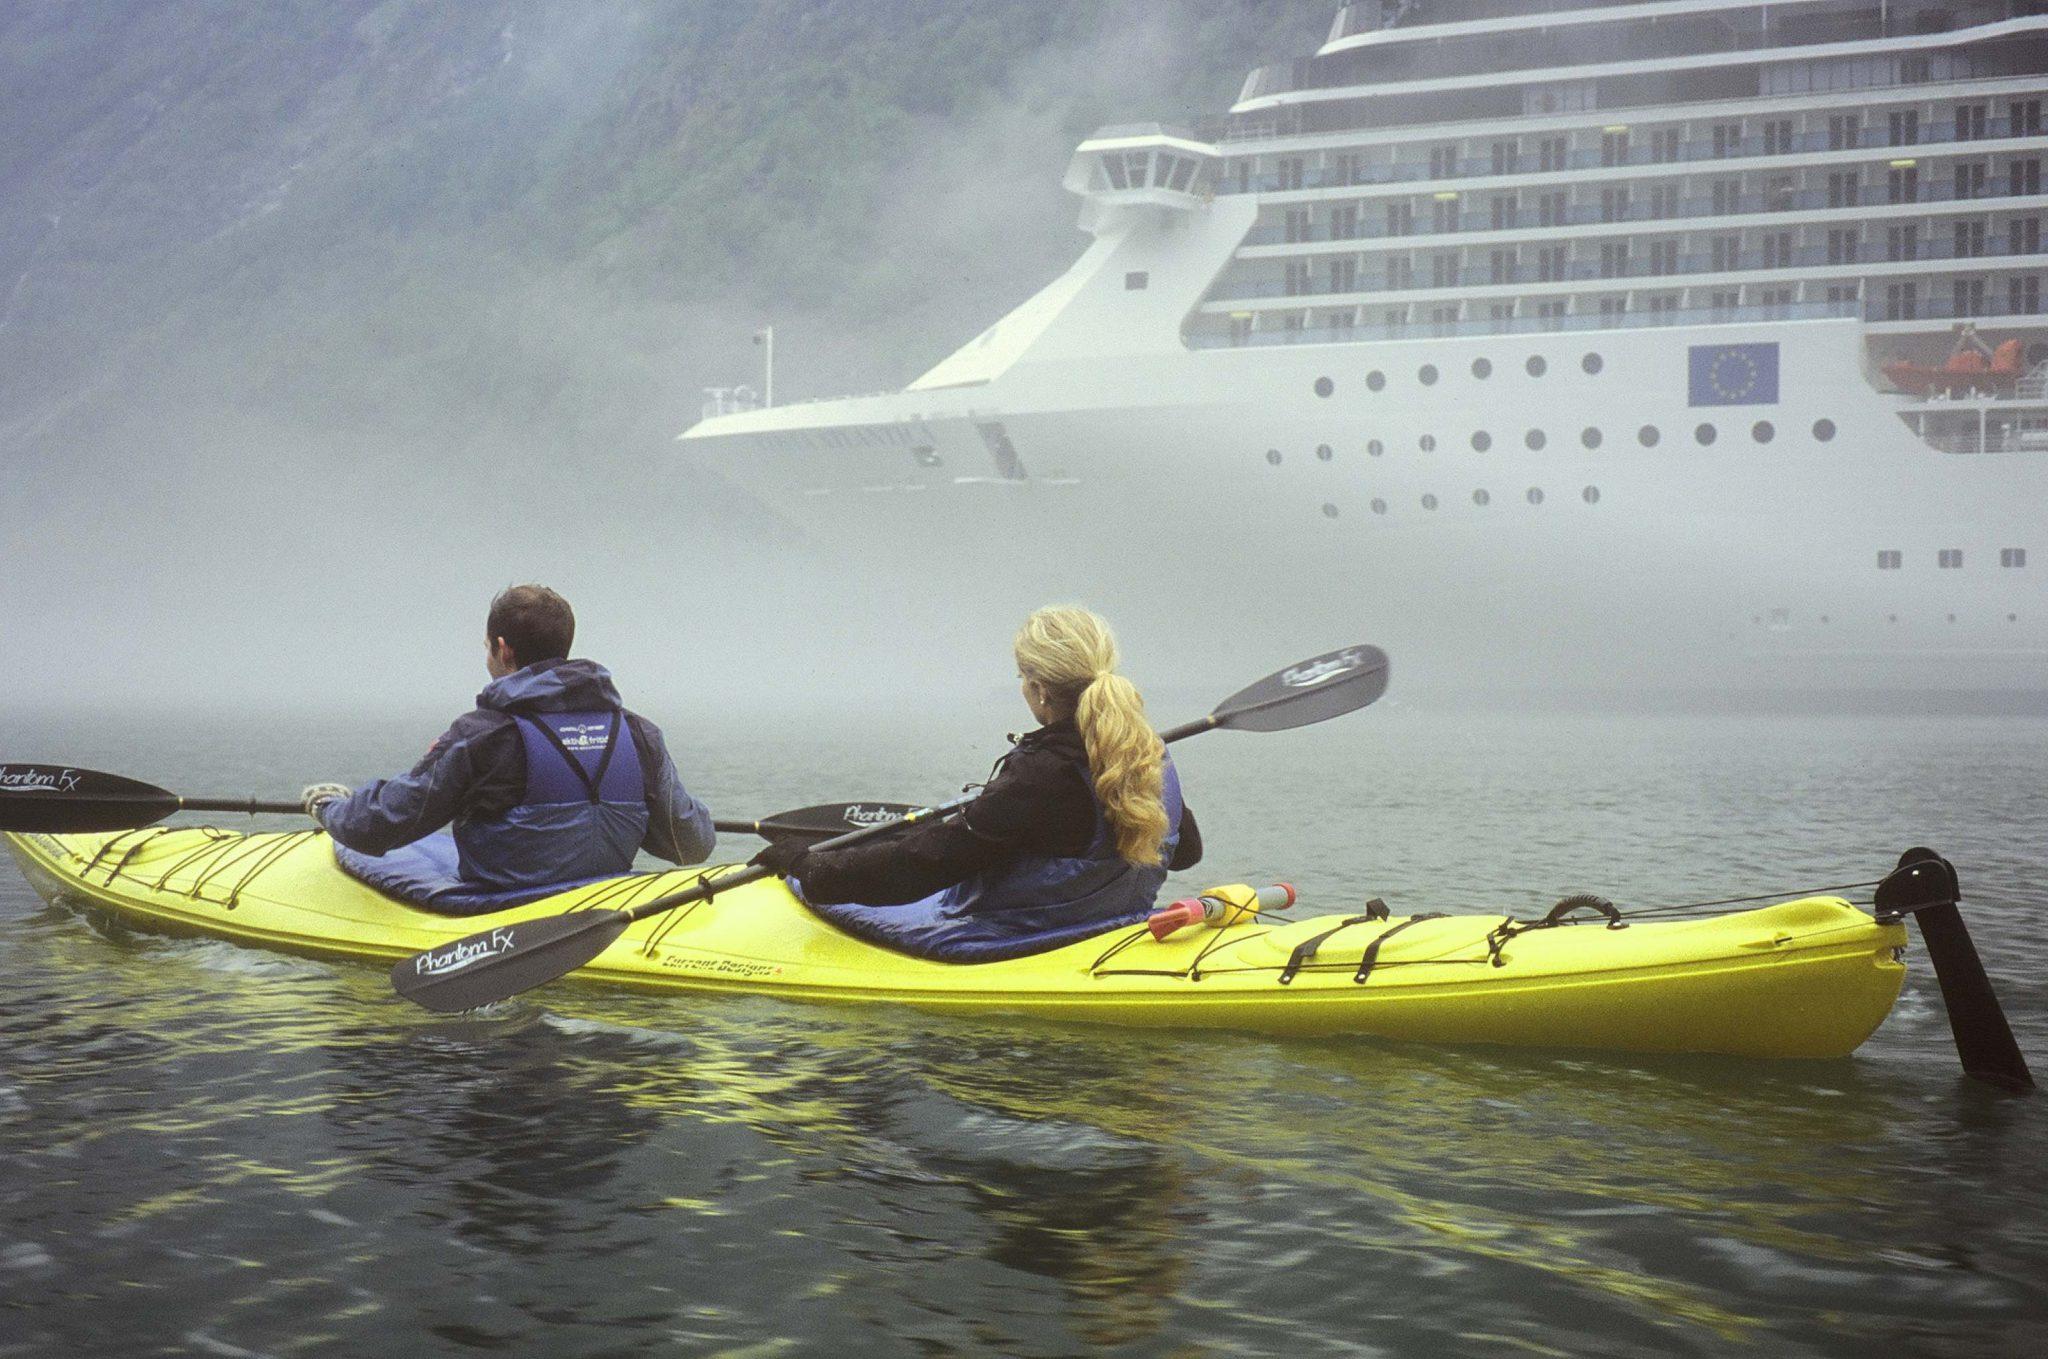 Coastal Odyssey Discount: 20% off Kayaking